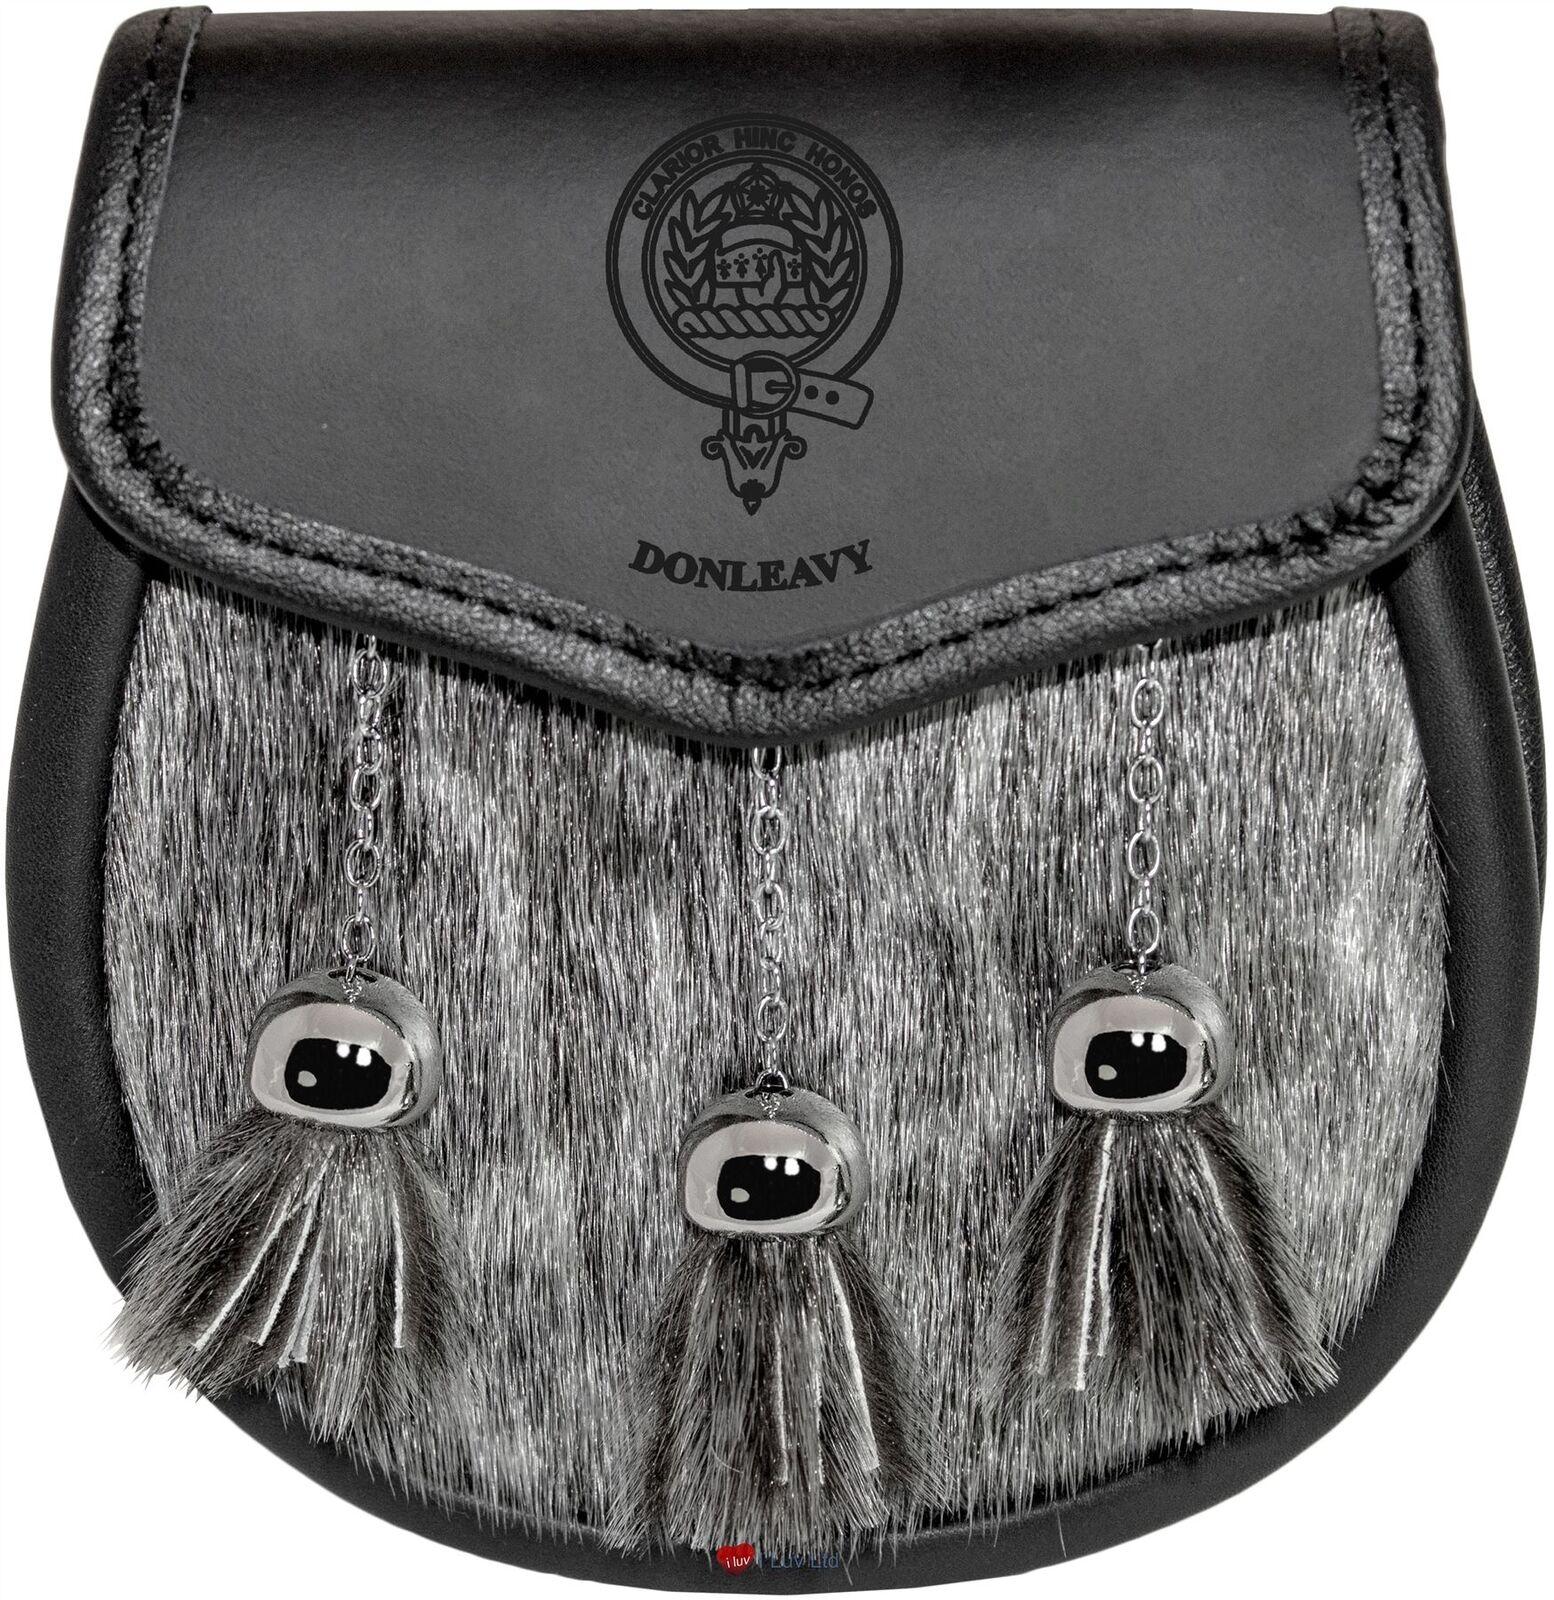 Donleavy Semi Dress Sporran Fur Plain Leather Flap Scottish Clan Crest